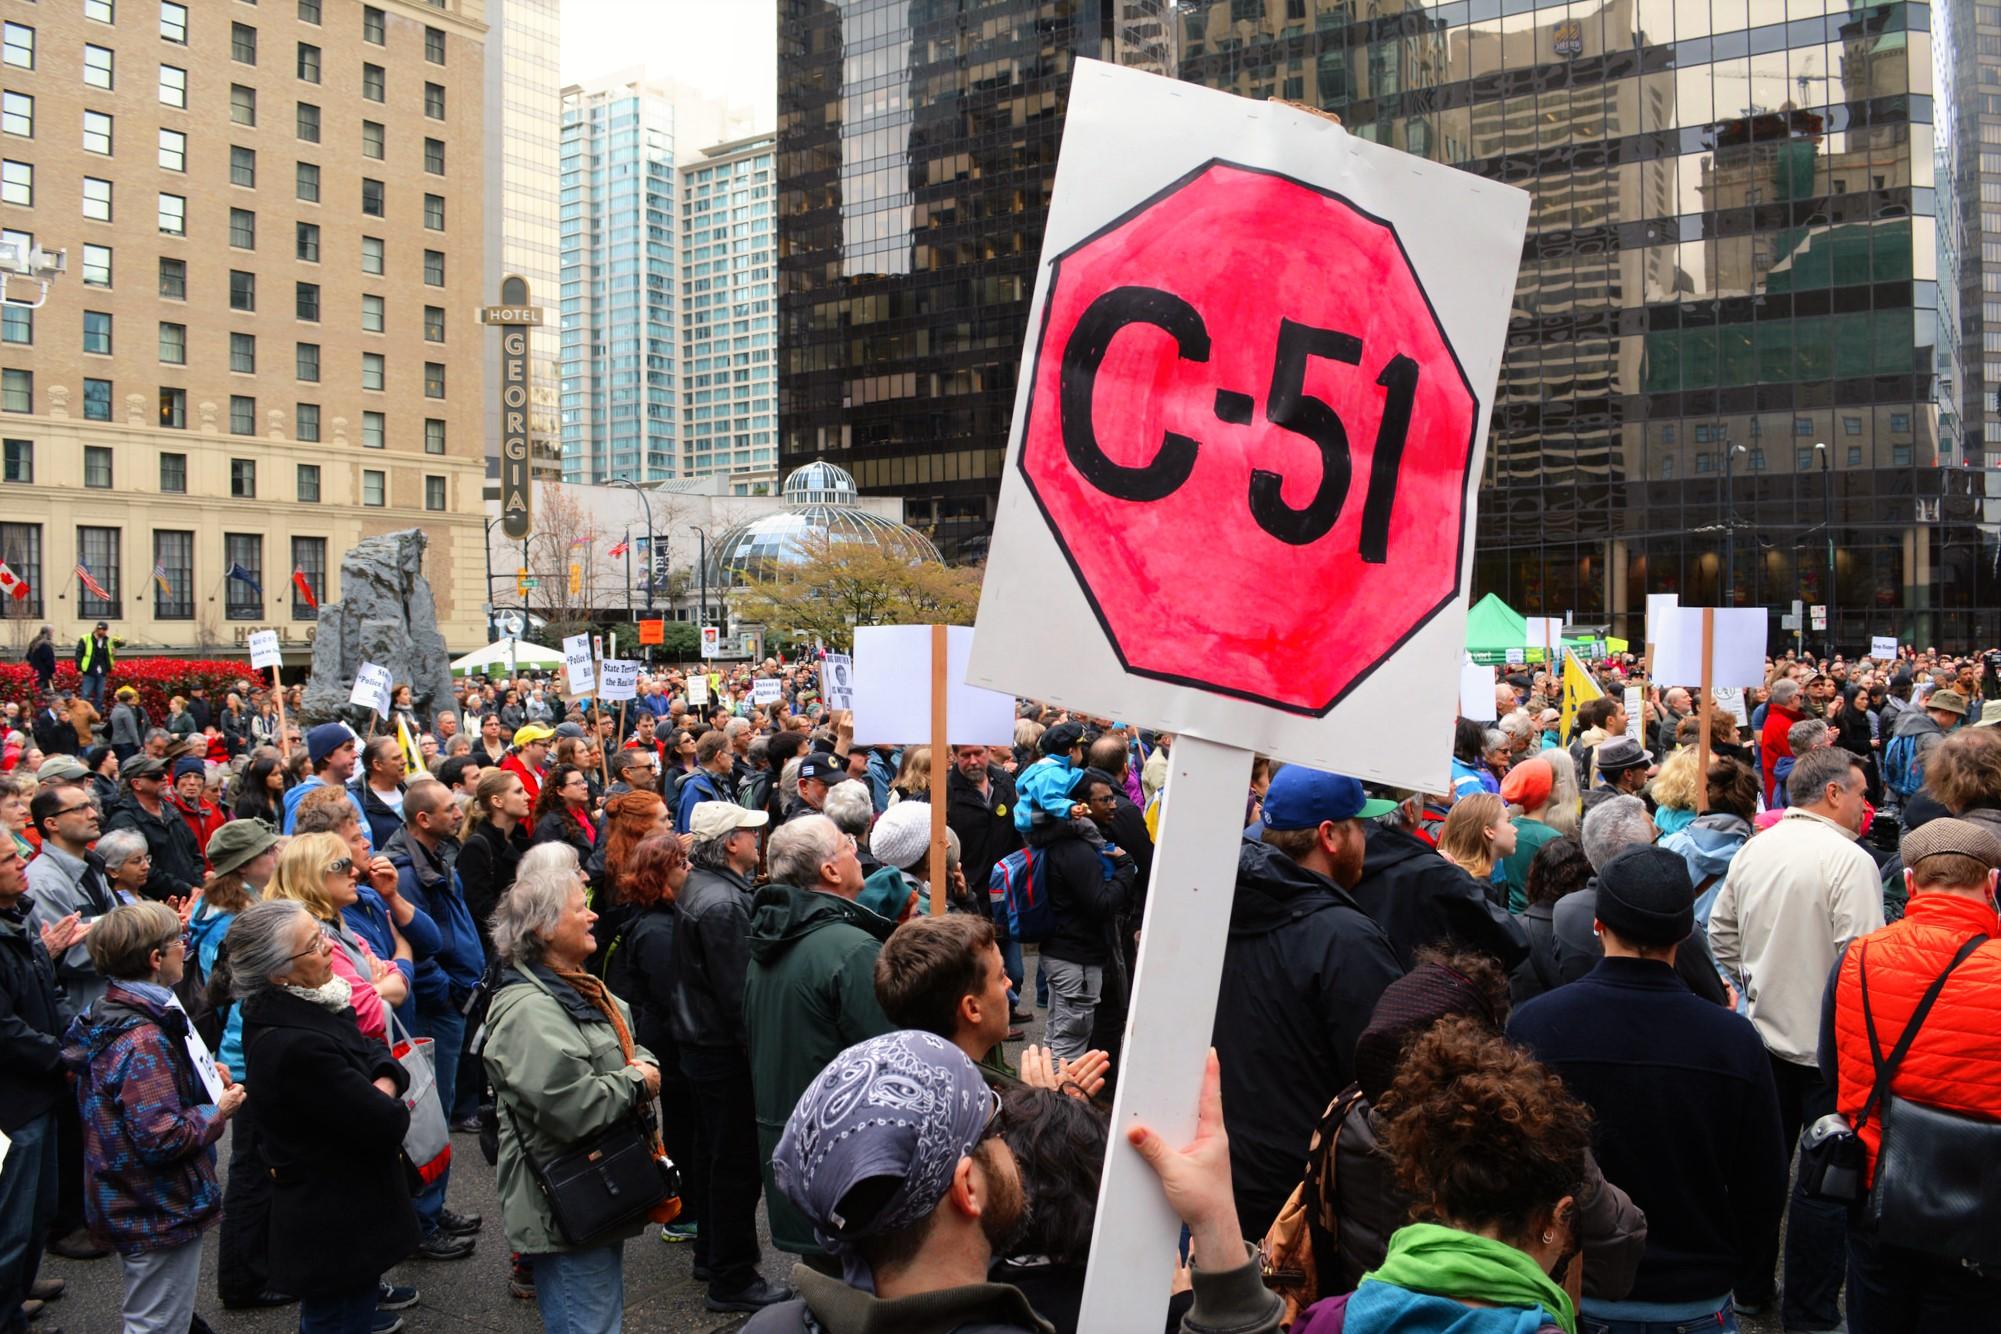 C-51_Protest.jpg